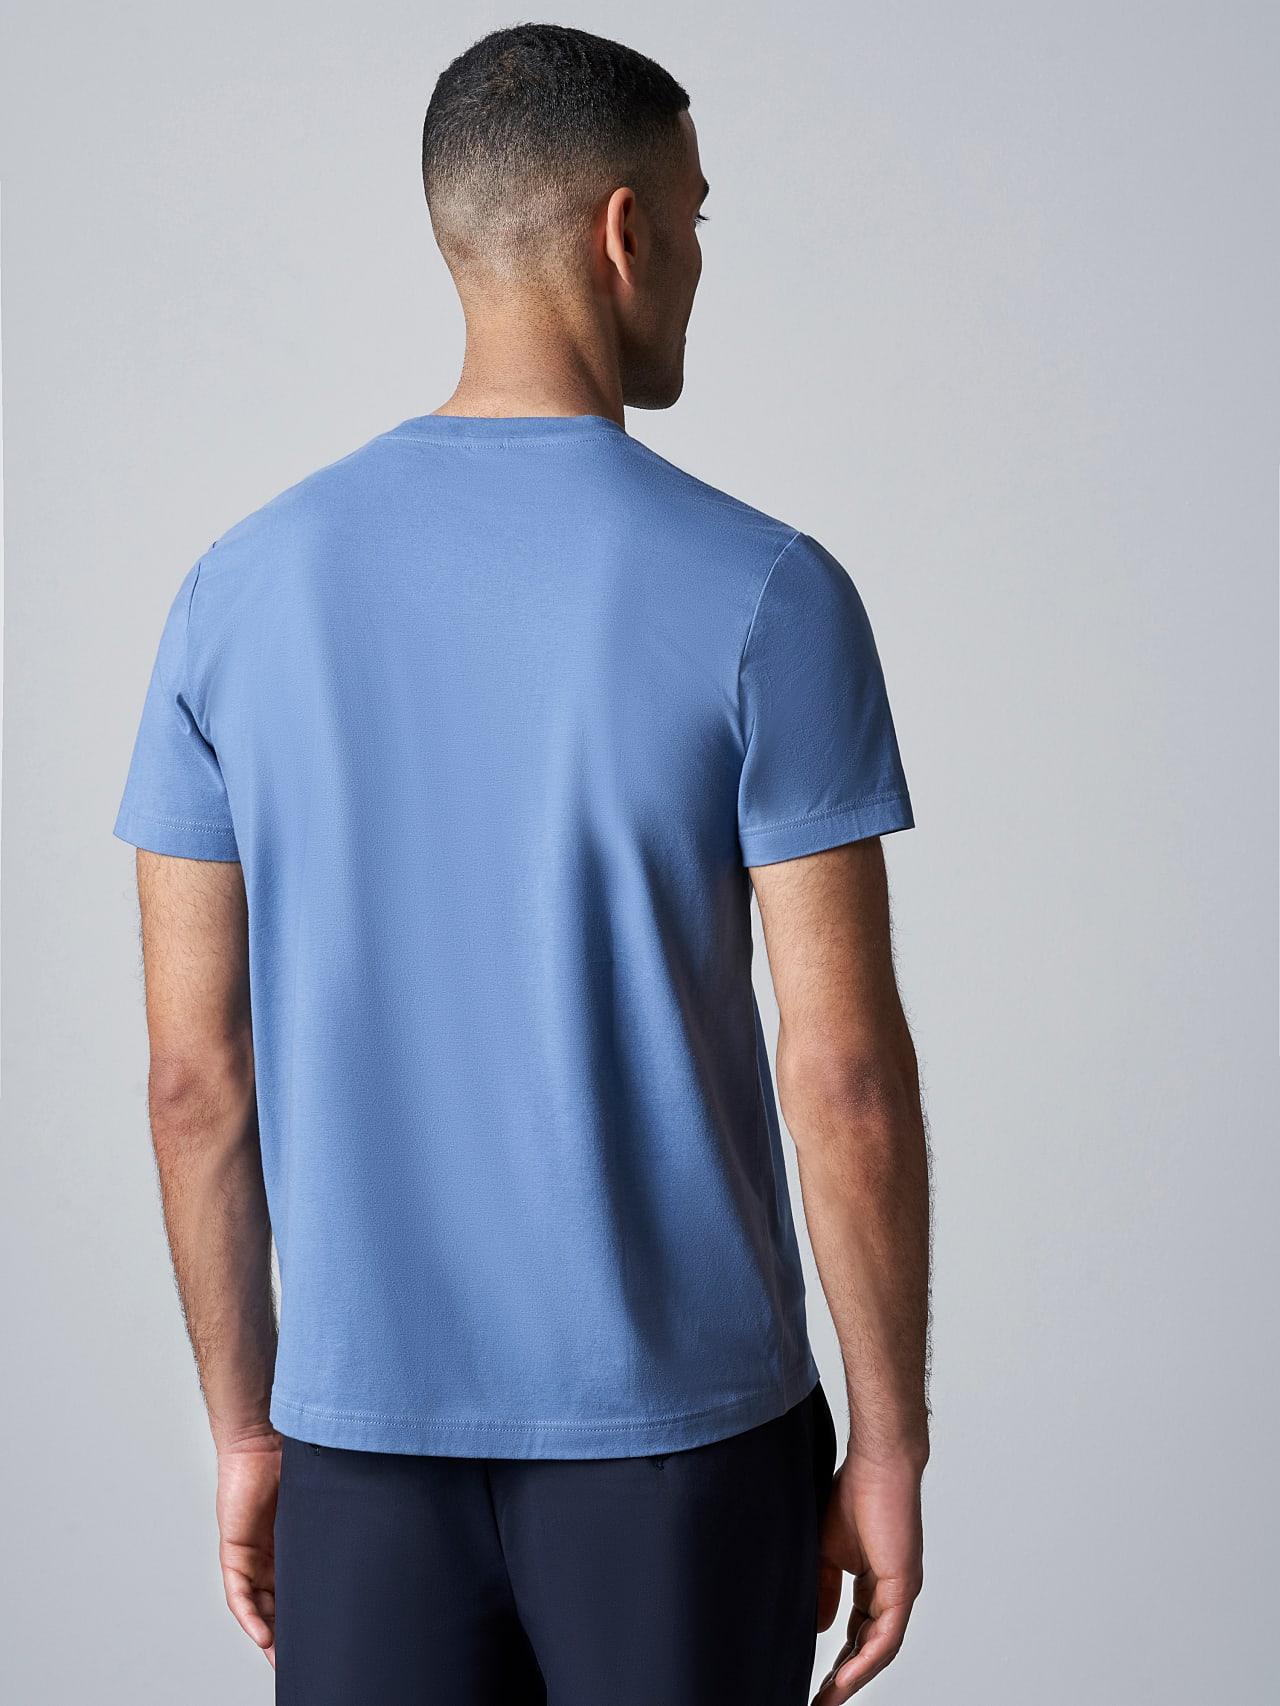 JANOS V3.Y5.02 Logo Embroidery T-Shirt light blue Right Alpha Tauri